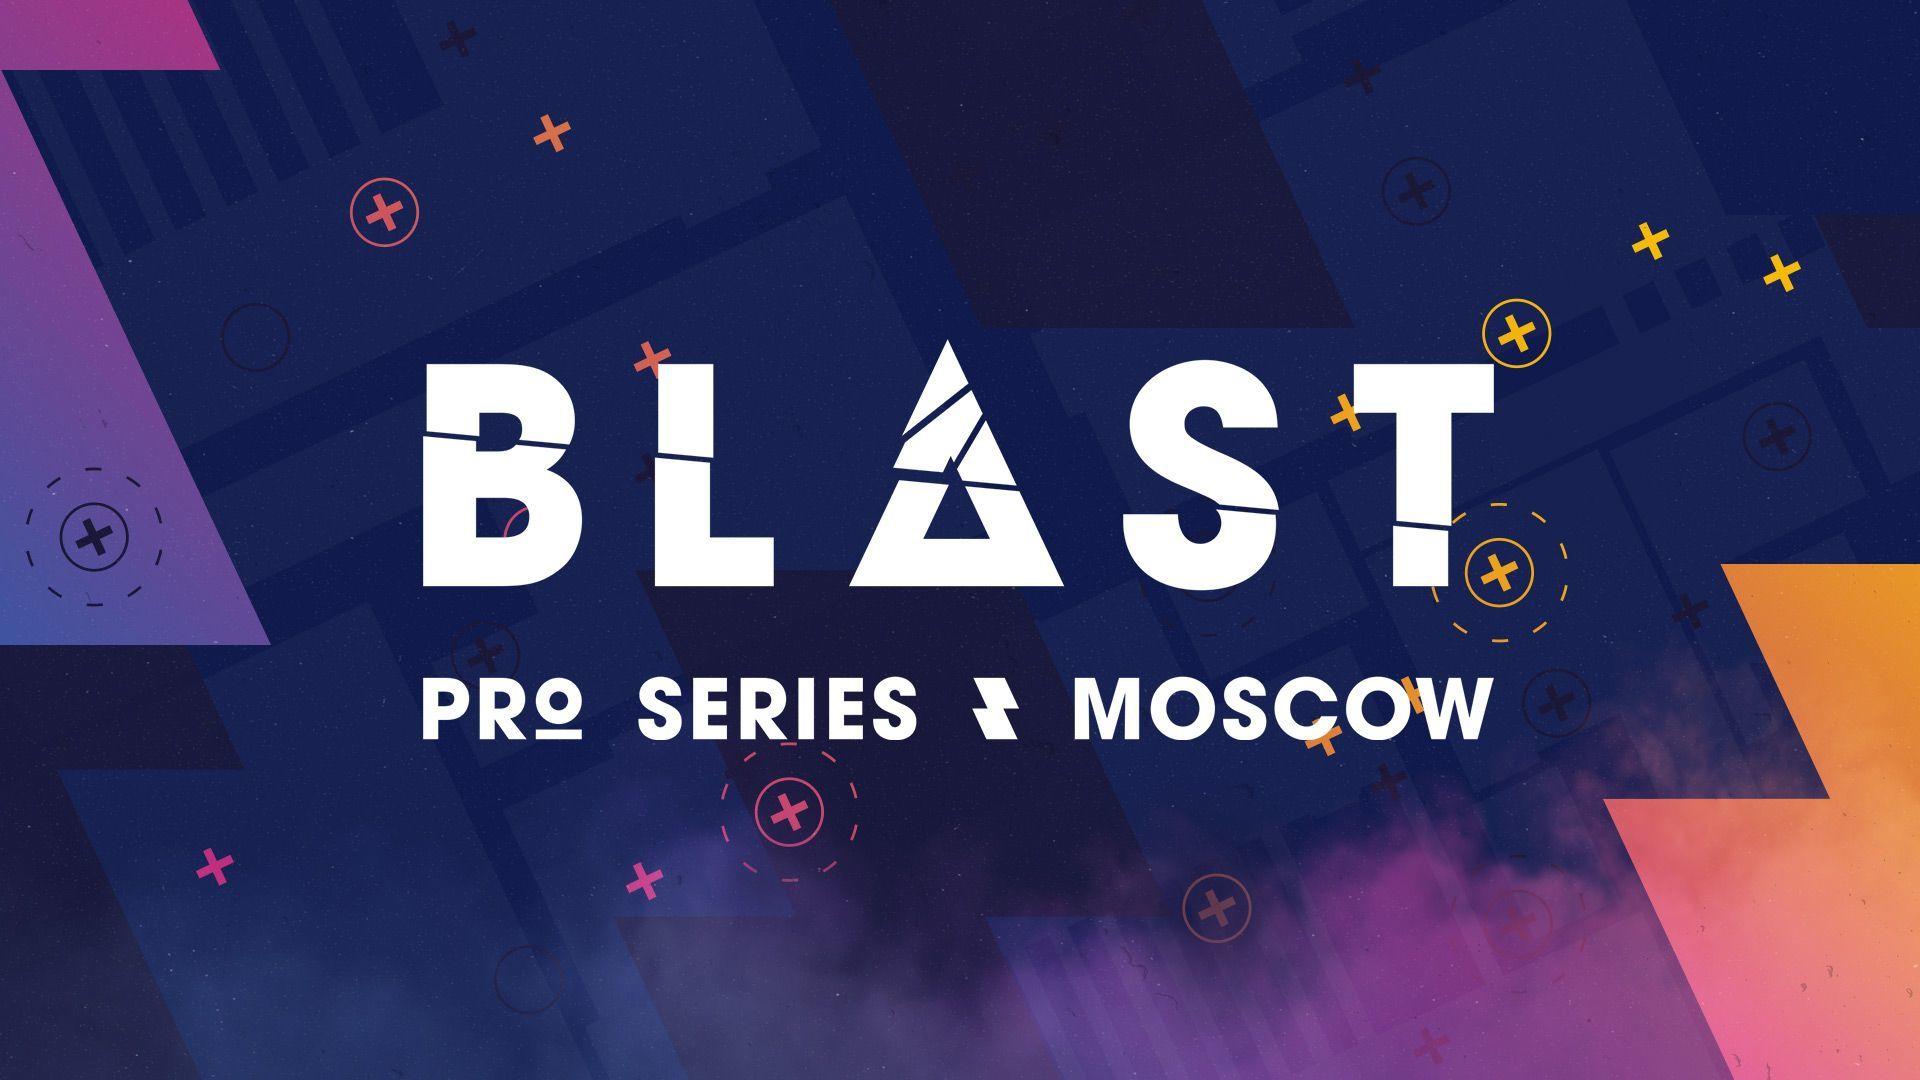 BLAST Pro Series Moscow пройдет в ВТБ Арена